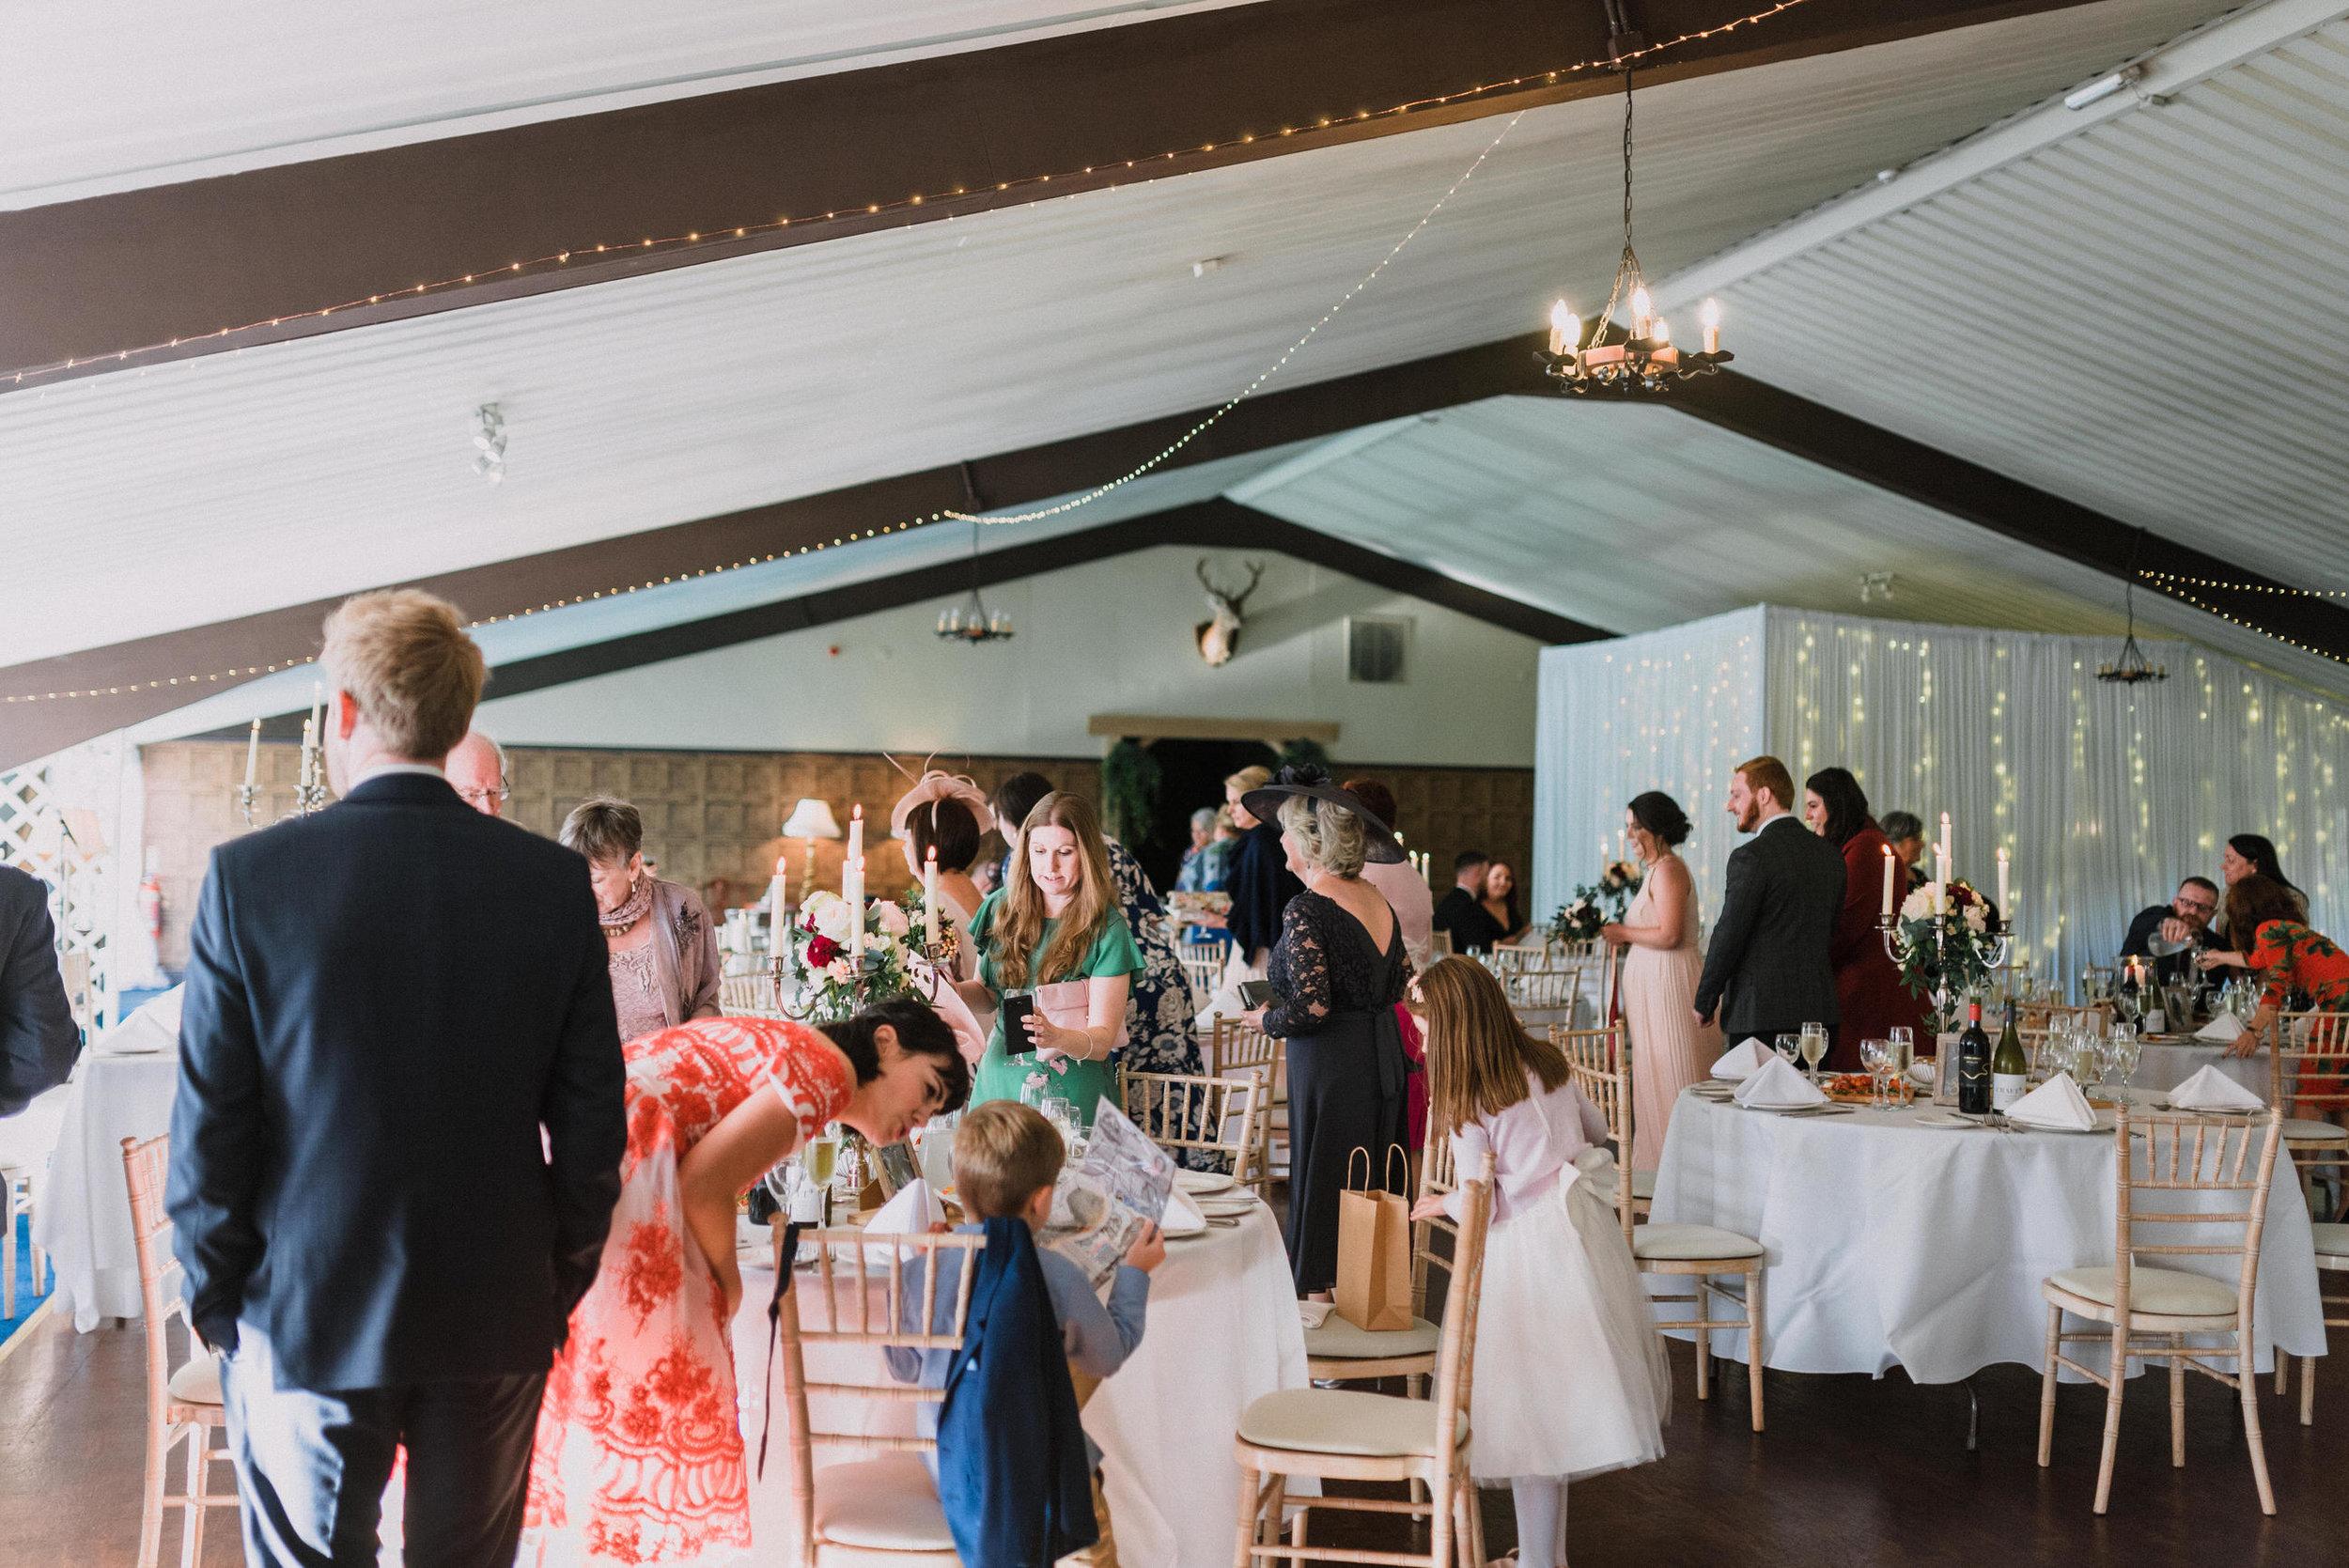 lissanoure castle wedding, northern ireland wedding photographer, romantic northern irish wedding venue, castle wedding ireland, natural wedding photography ni (103).jpg